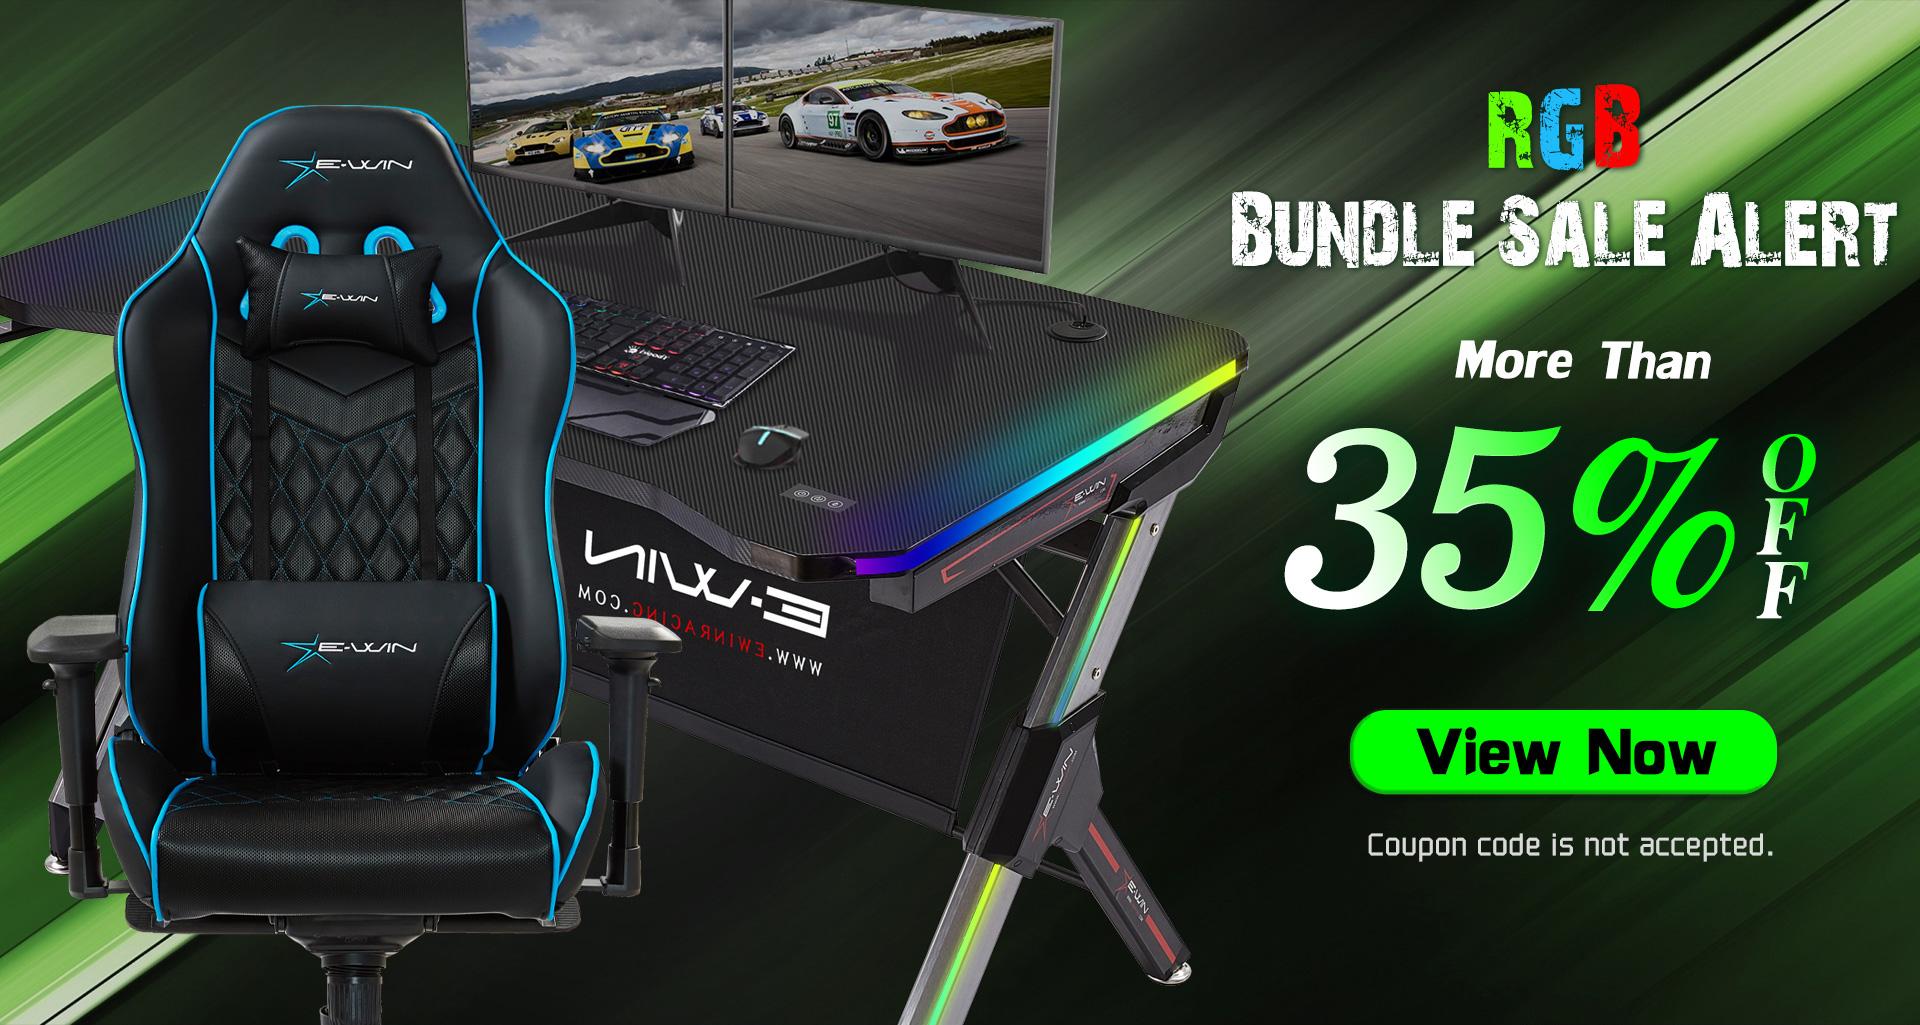 Ewin Gaming Chair&Desk Christmas Sale